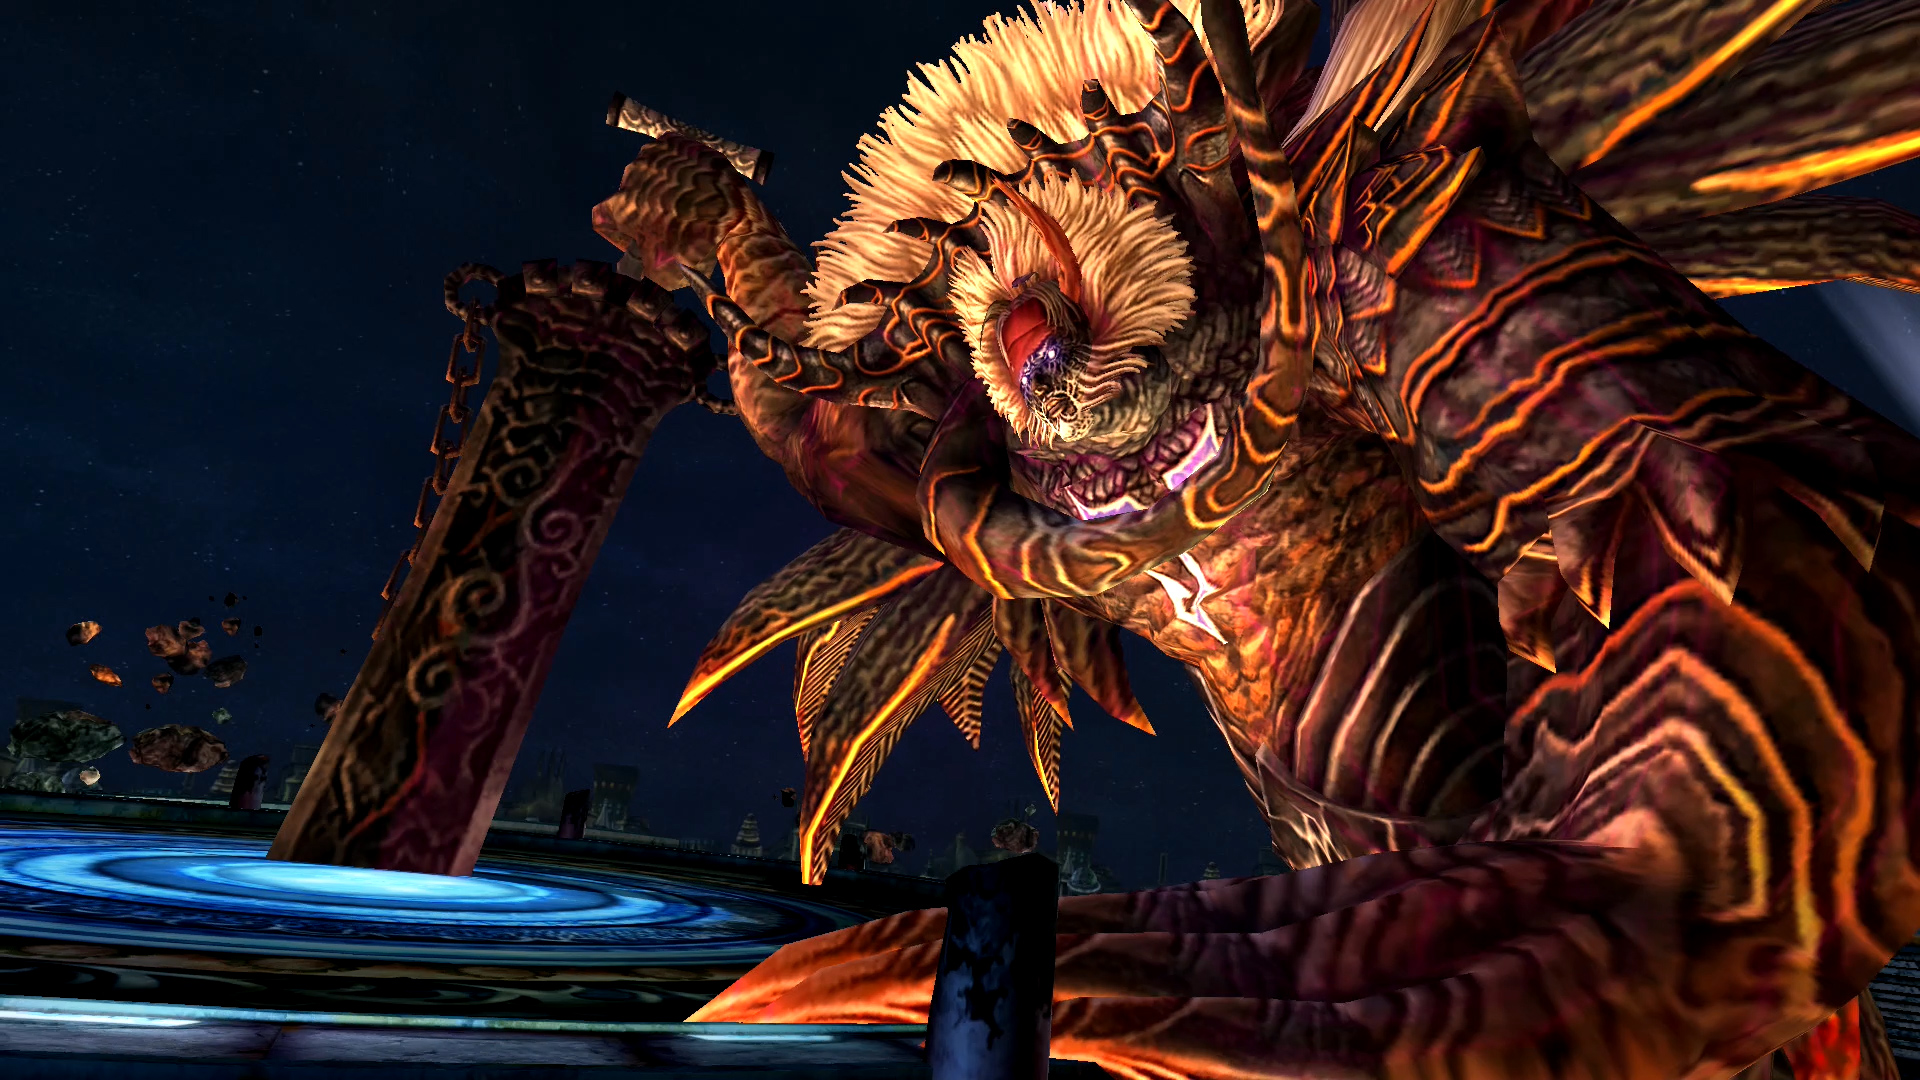 Wallpapers, fond d'ecran pour Final Fantasy X / X-2 HD PC, PS3, PS4 | 2014